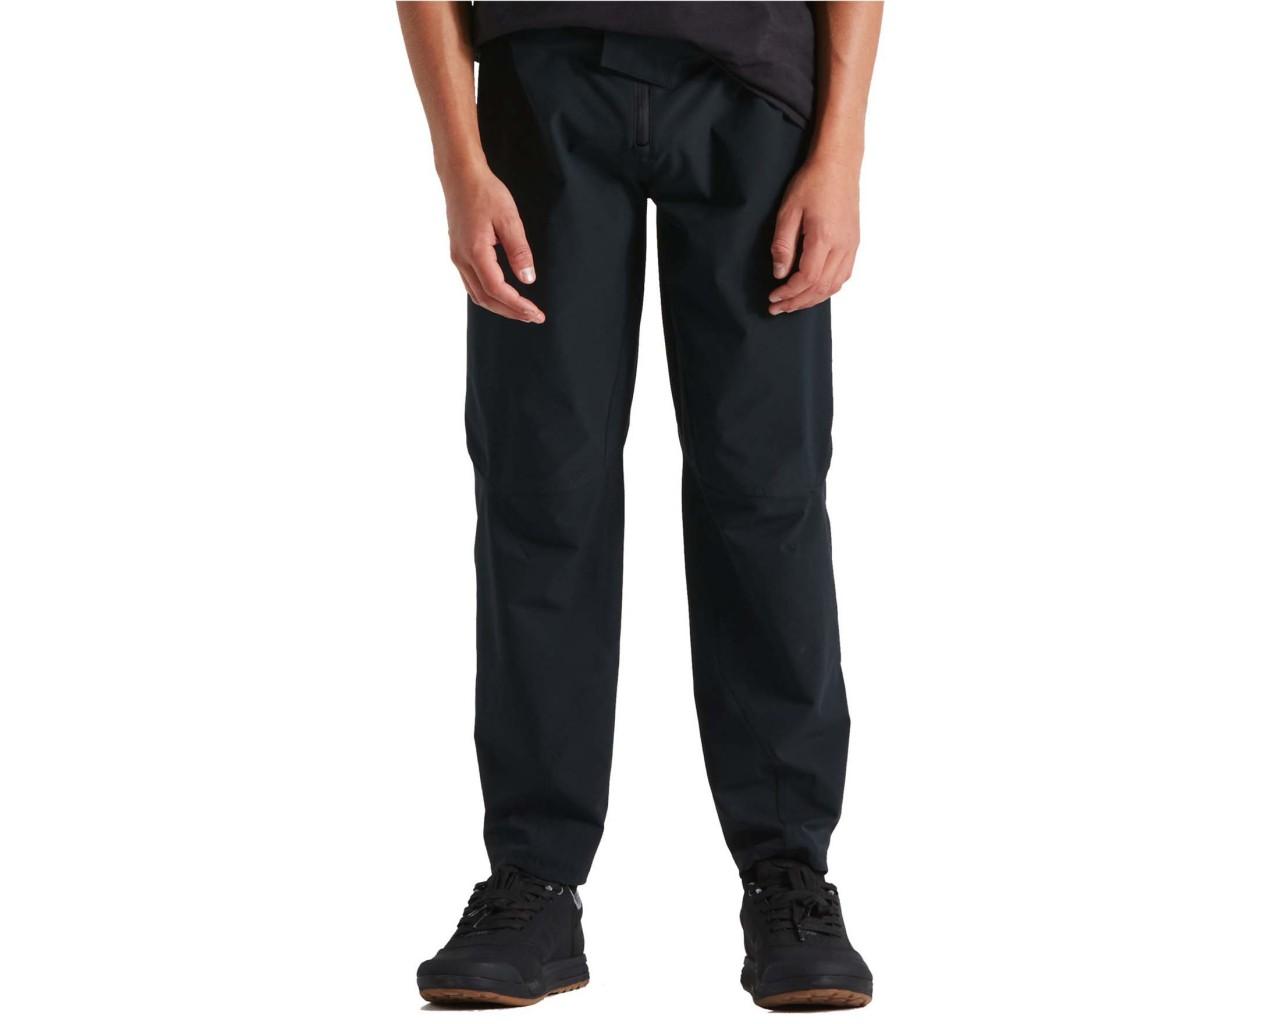 Specialized Trail Pant - Jugendhose | black